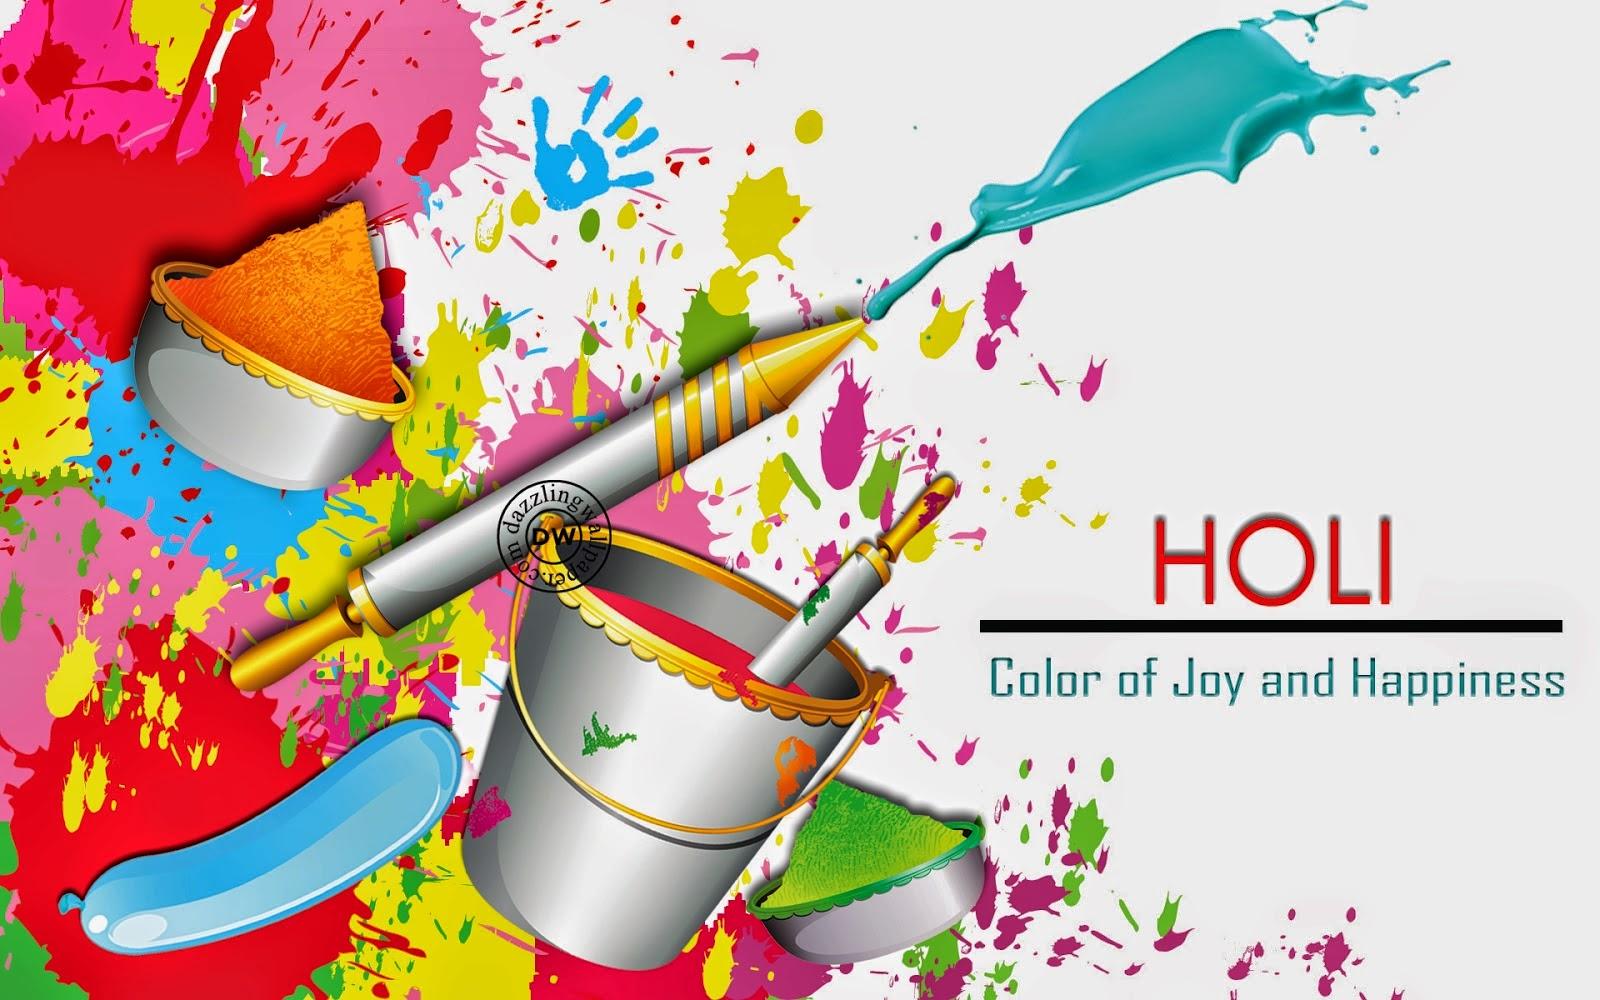 Happy Holi 2015 WhatsApp Video Wallpaper